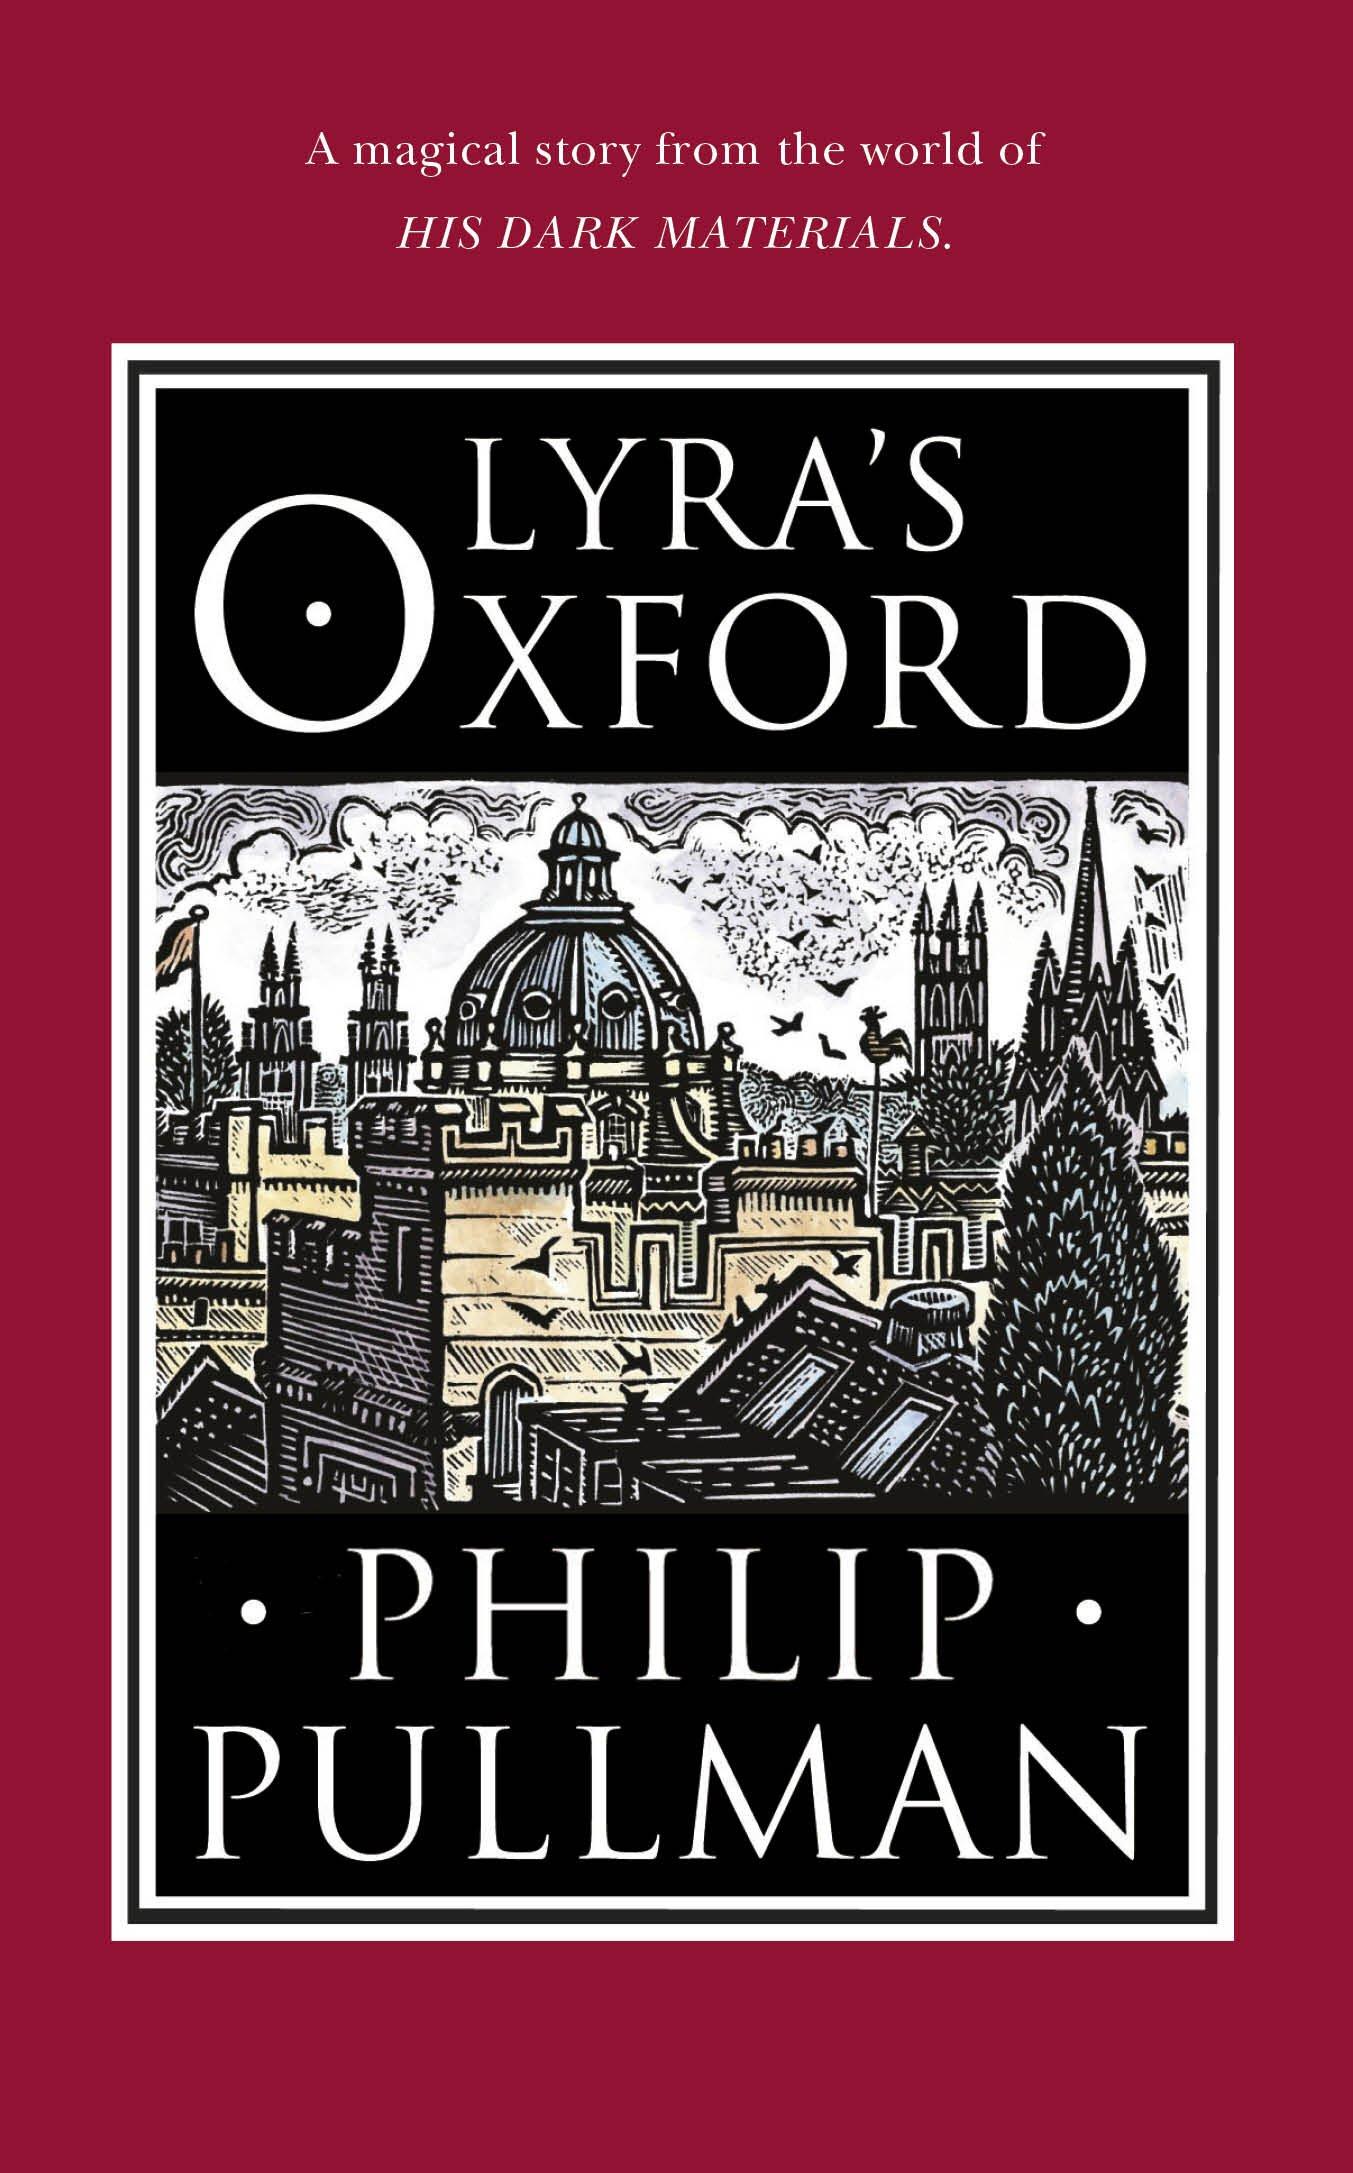 lyra-s-oxford-his-dark-materials